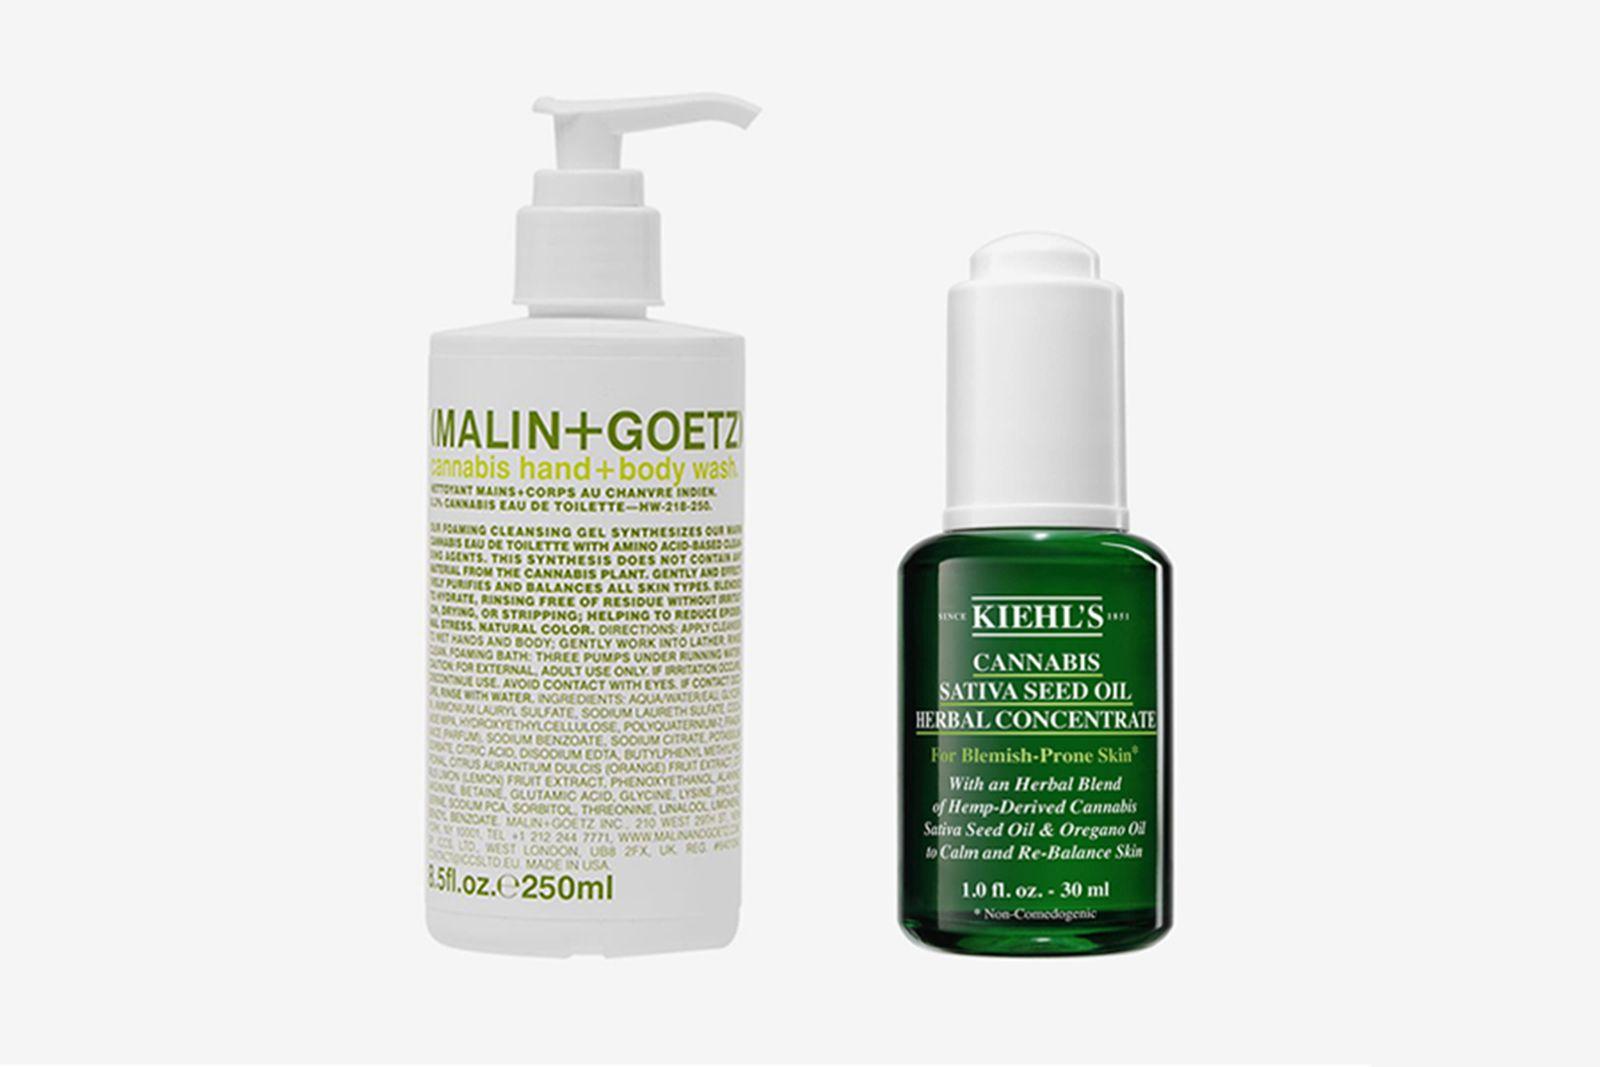 cbd grooming products 002 cannuka kiehls malin+goetz